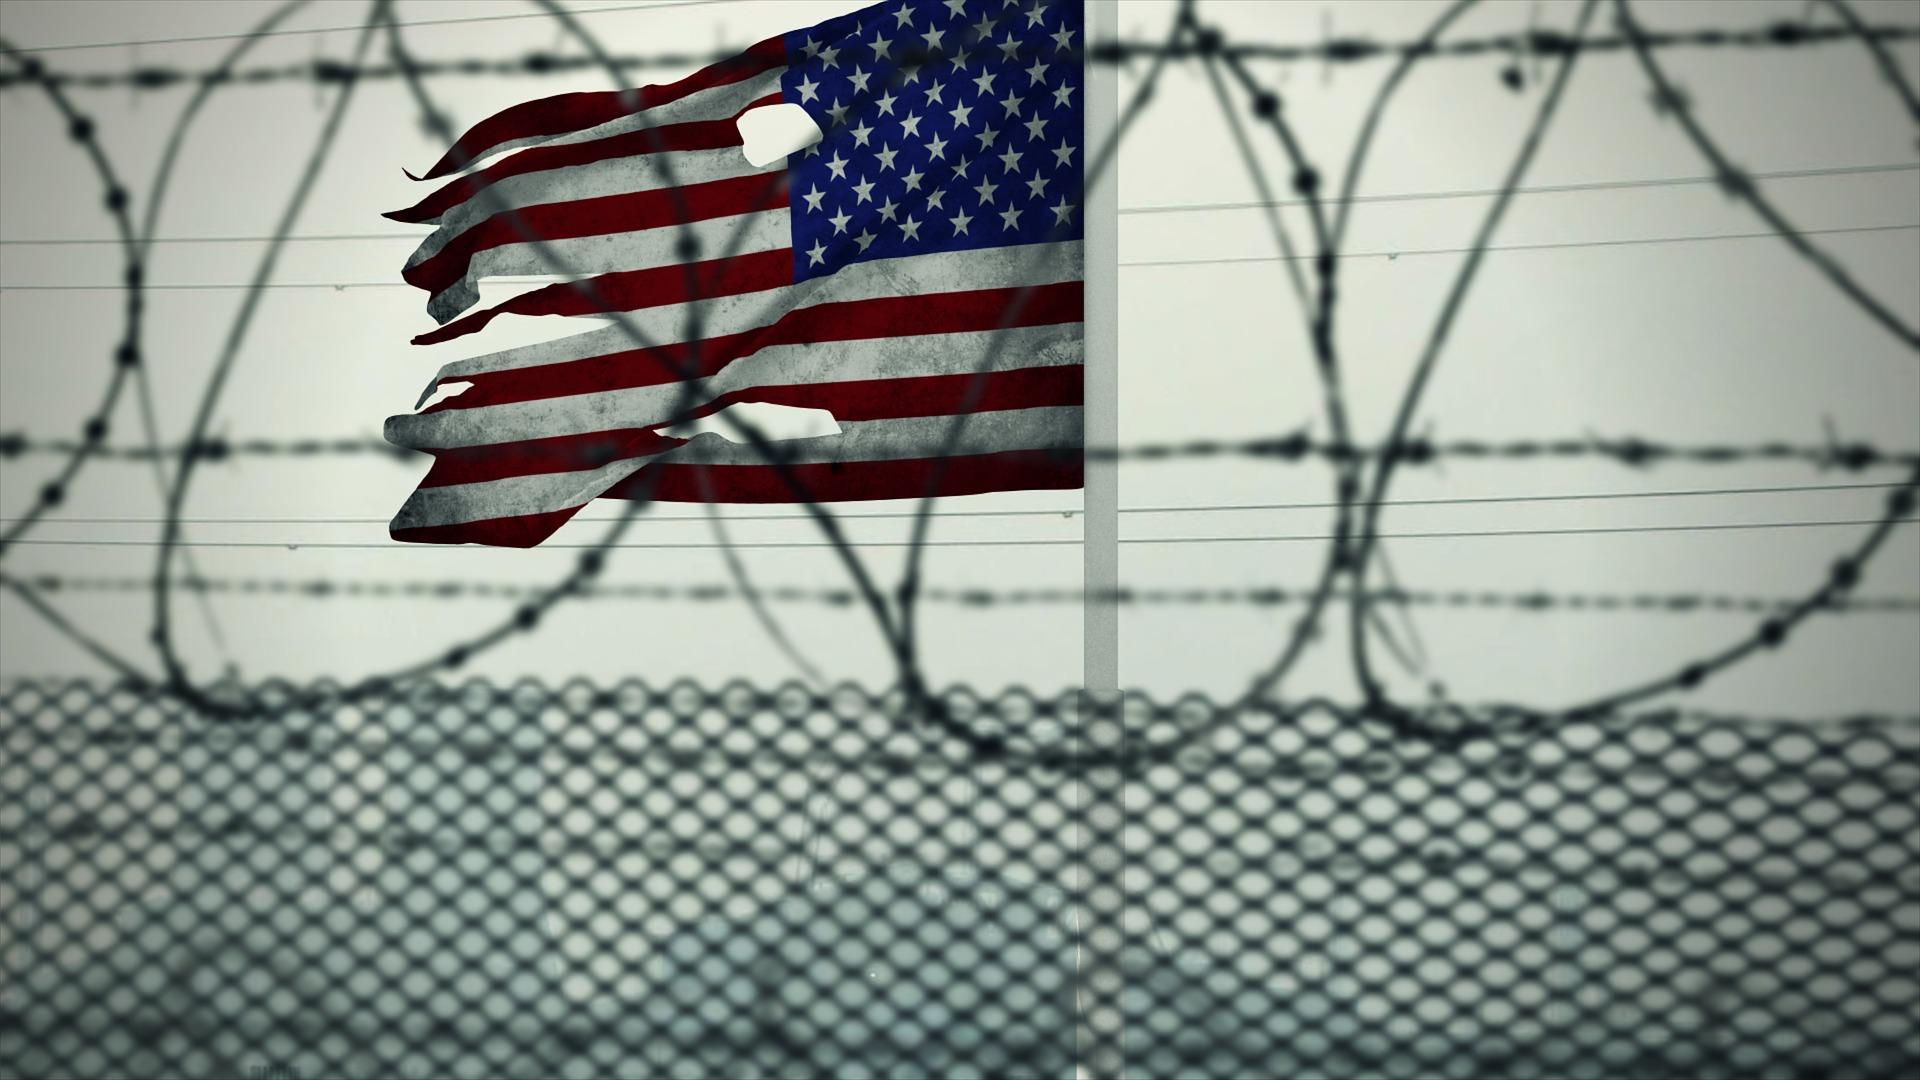 American flag behind jail fence